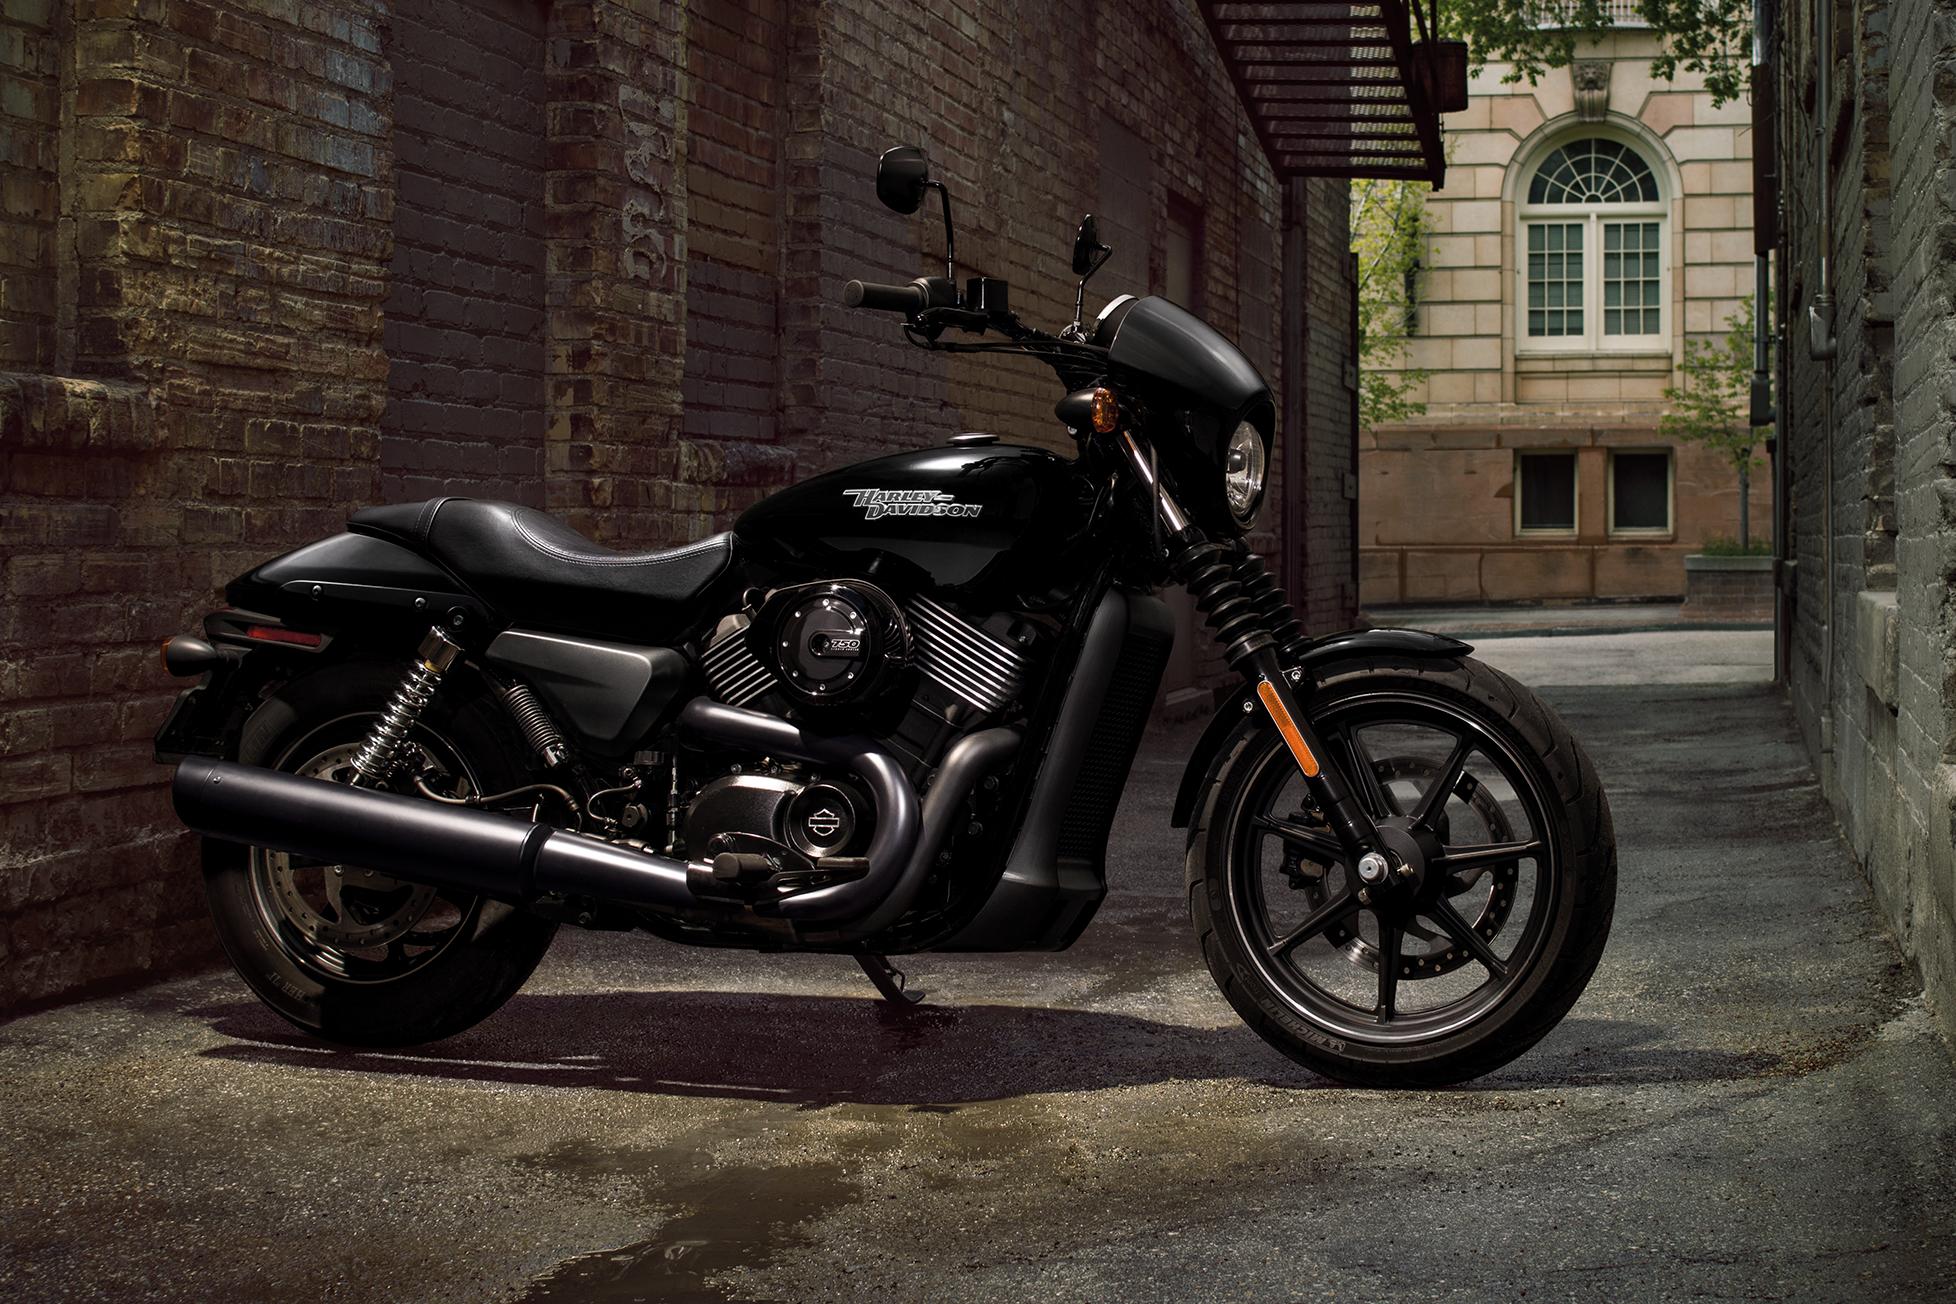 2018 harley davidson street 750 harley davidson usa rh harley davidson com Harley-Davidson Torque Spec Sheet Harley-Davidson Manual FLSTS